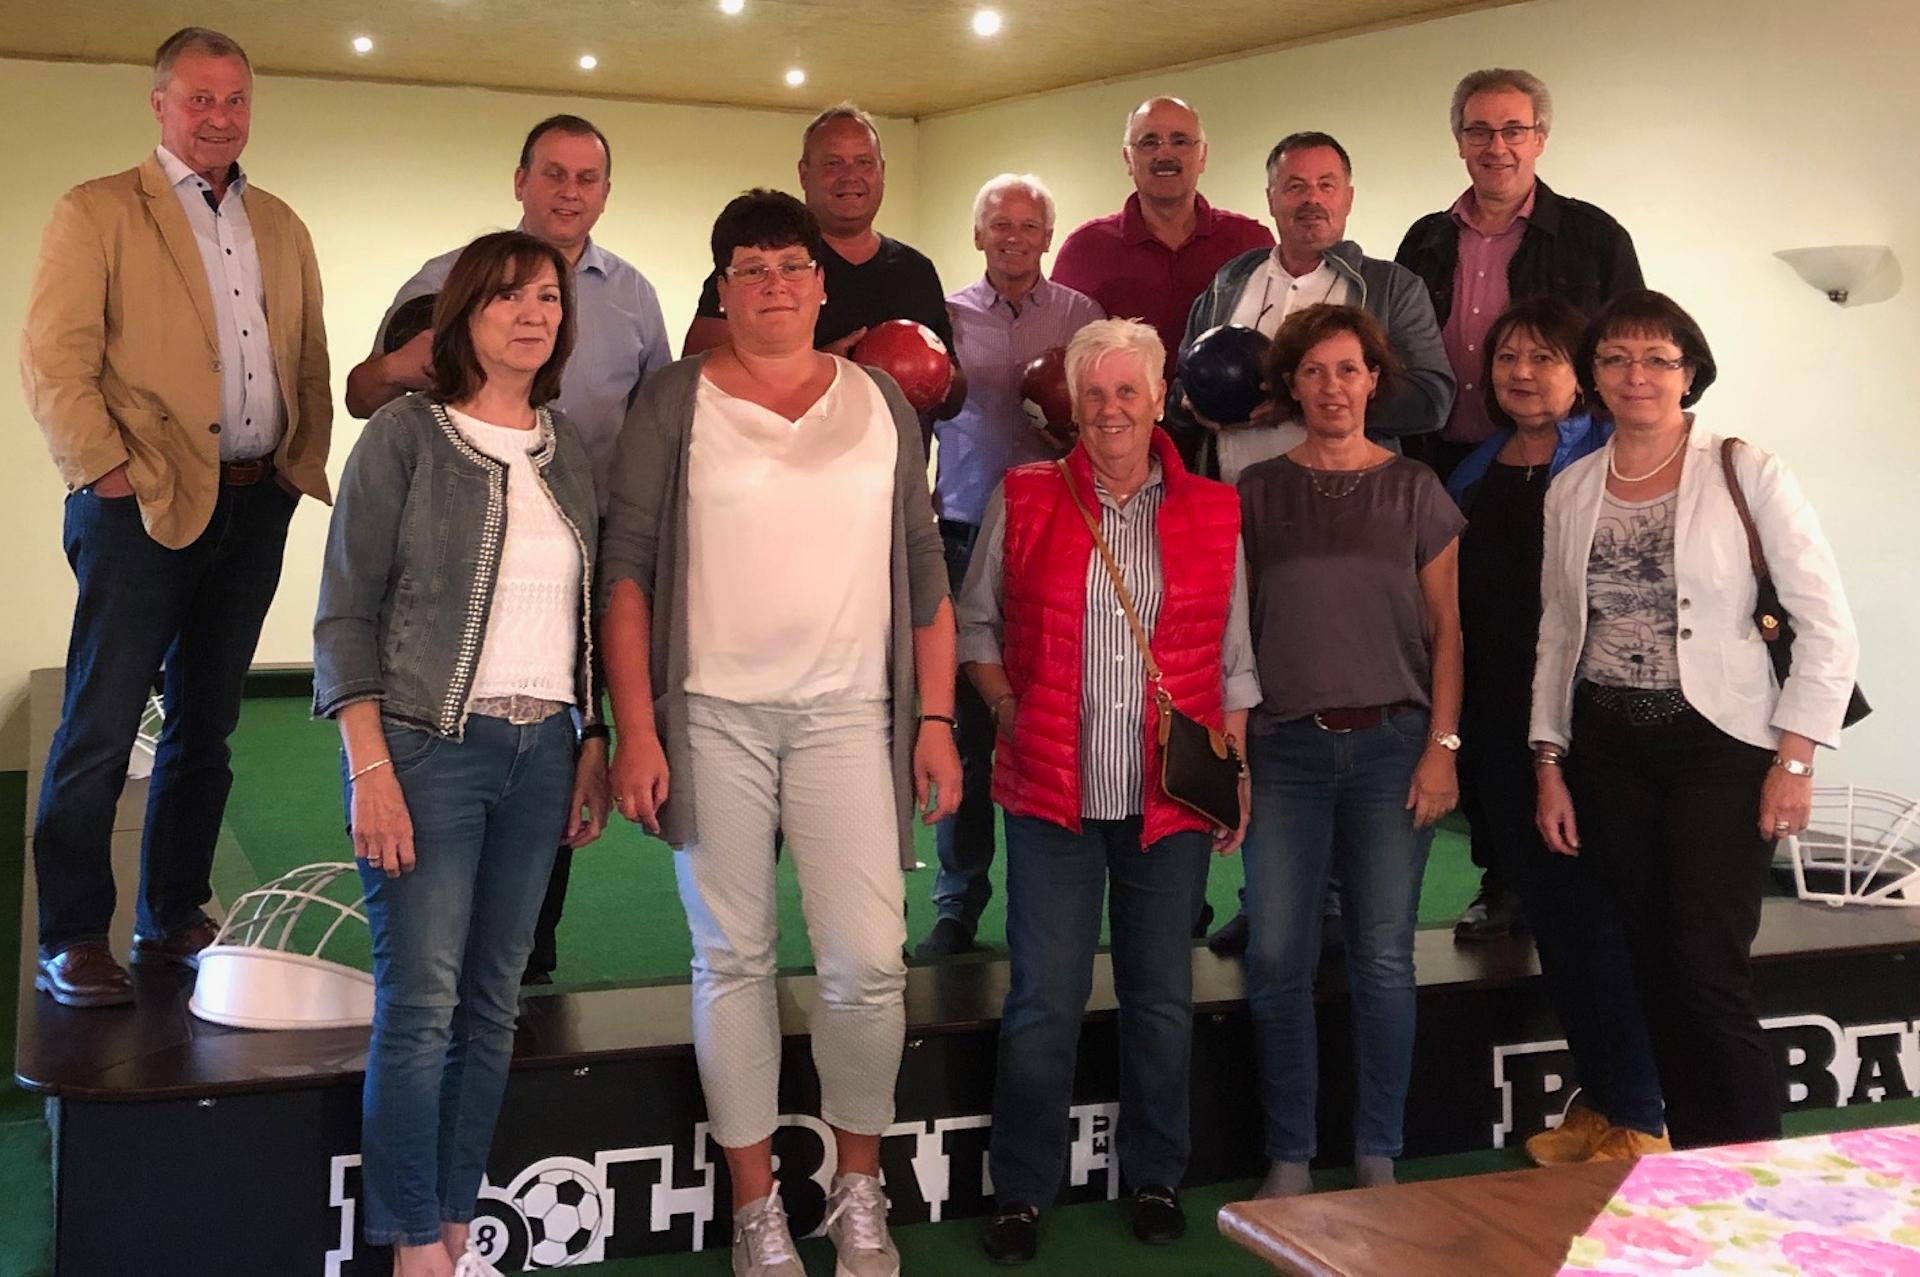 FWG Kreis Ahrweiler im Aufwind 2019